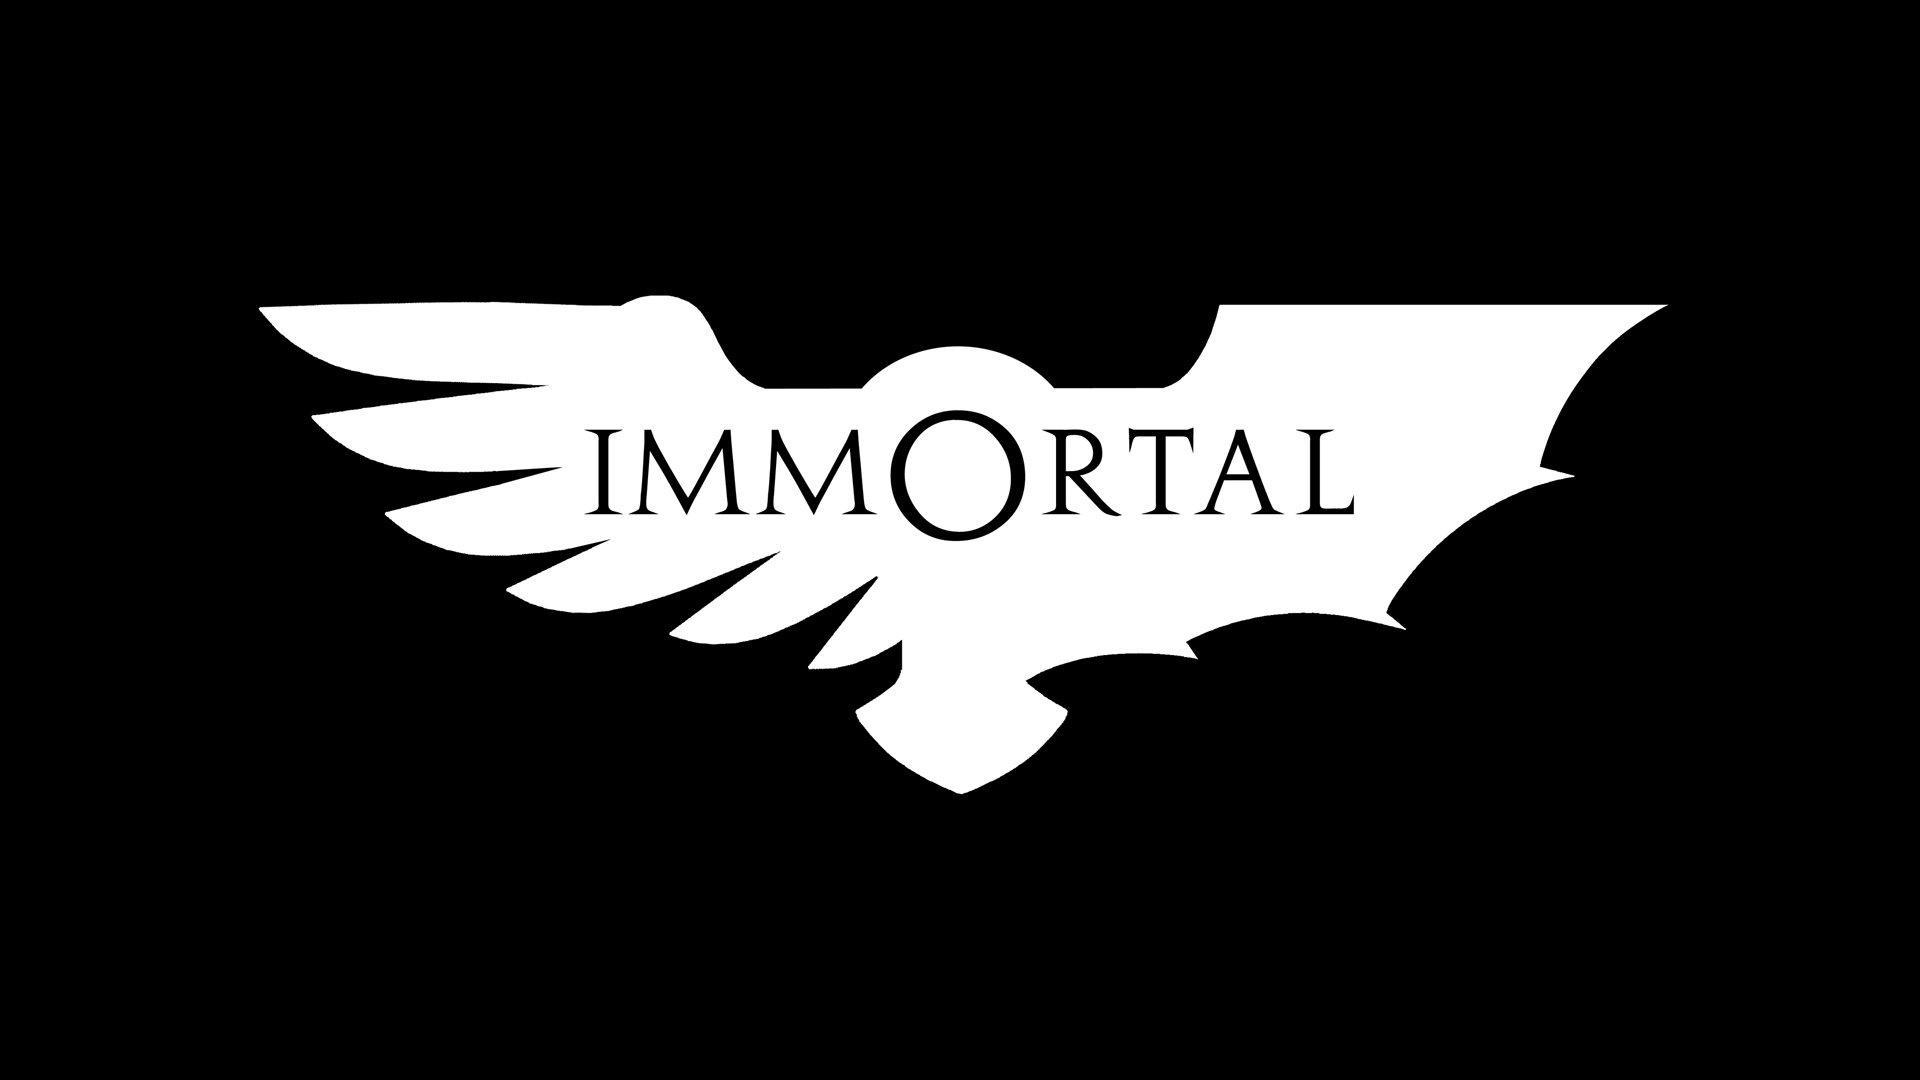 David sanhueza immortal logo black 2